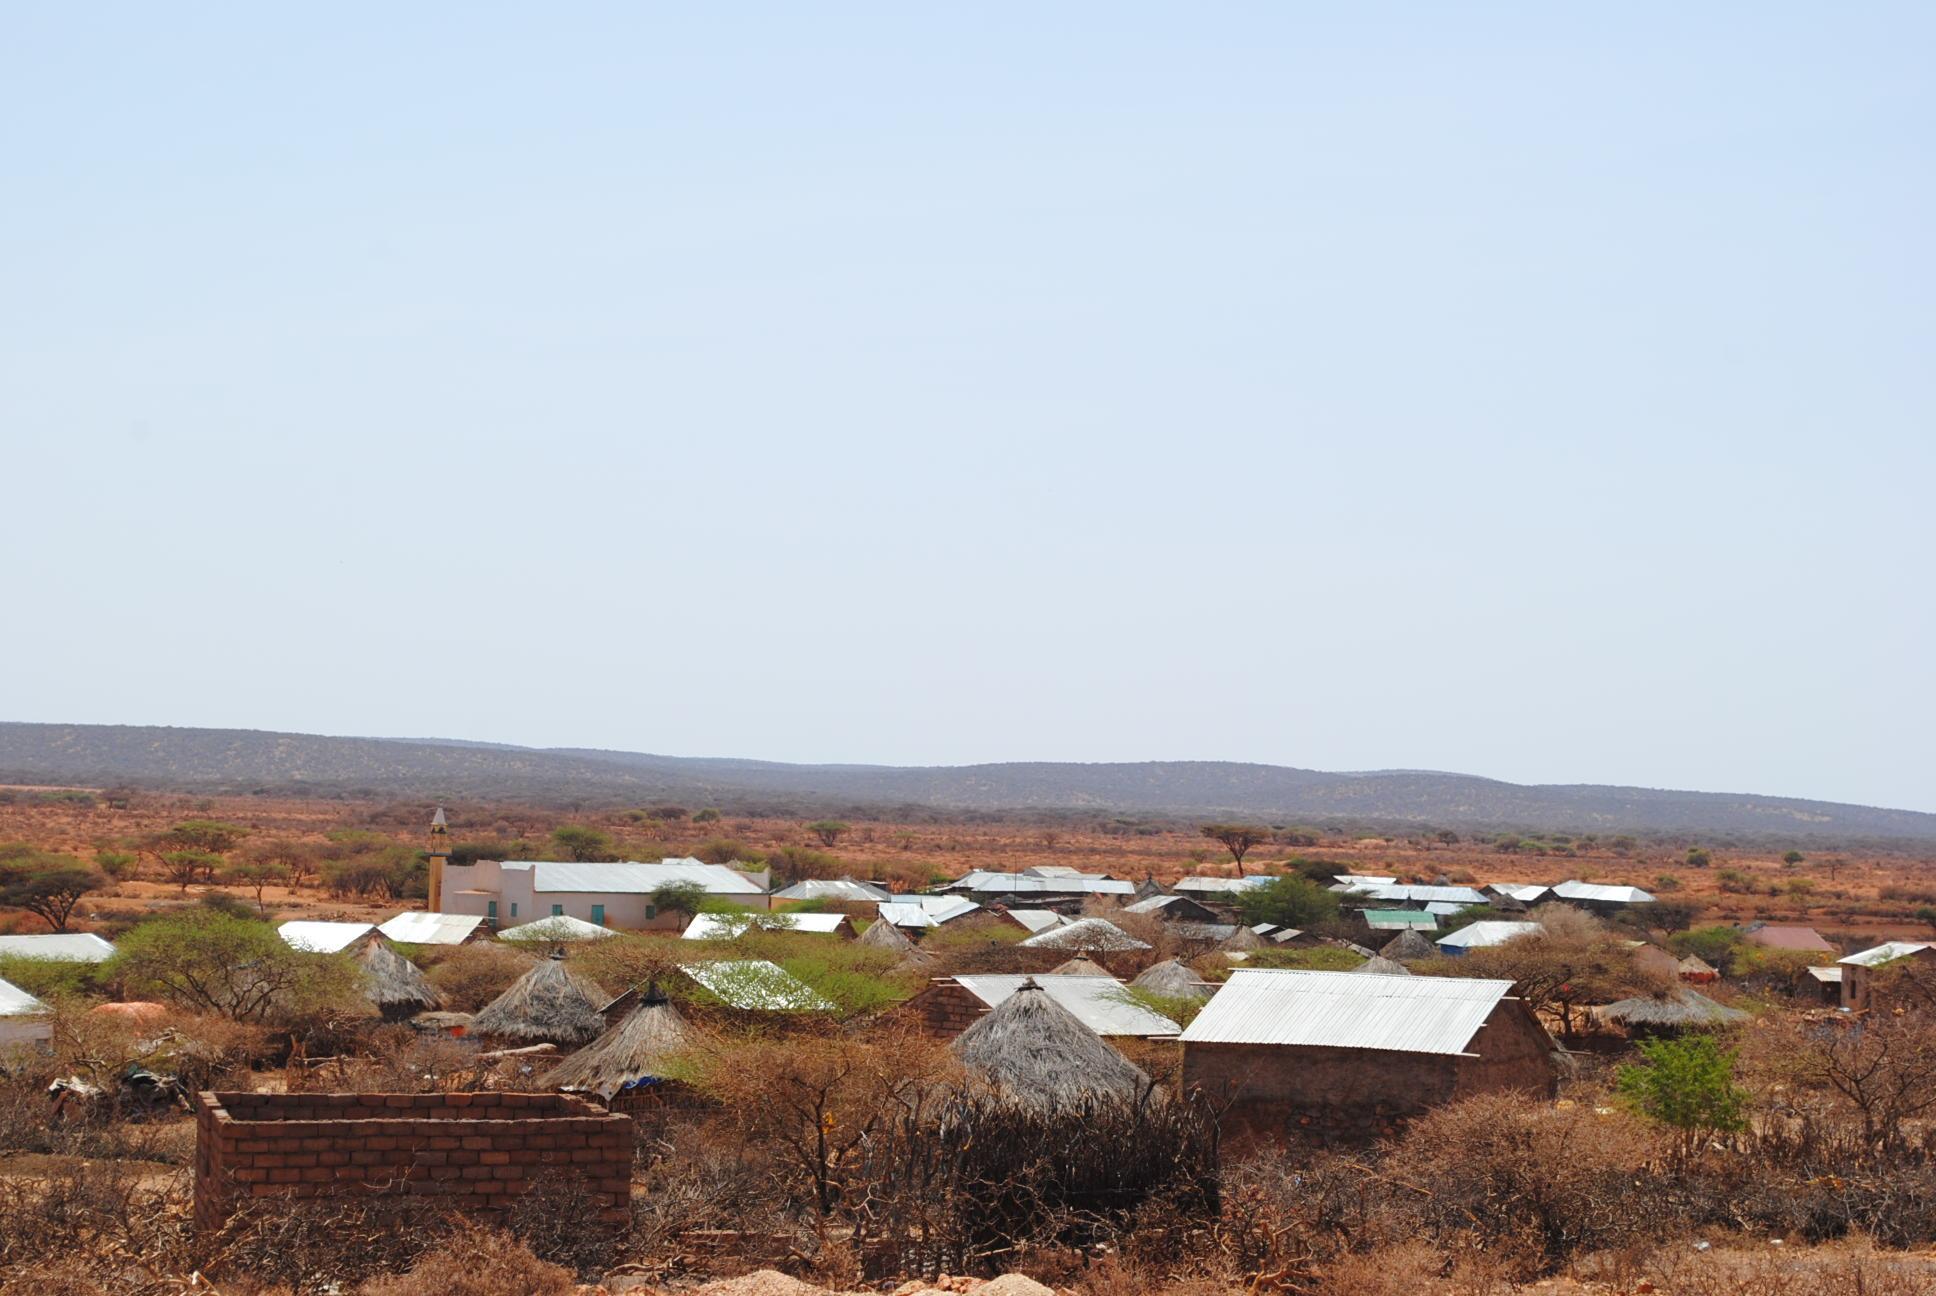 Hyenas kill villagers in northwestern Somaliland